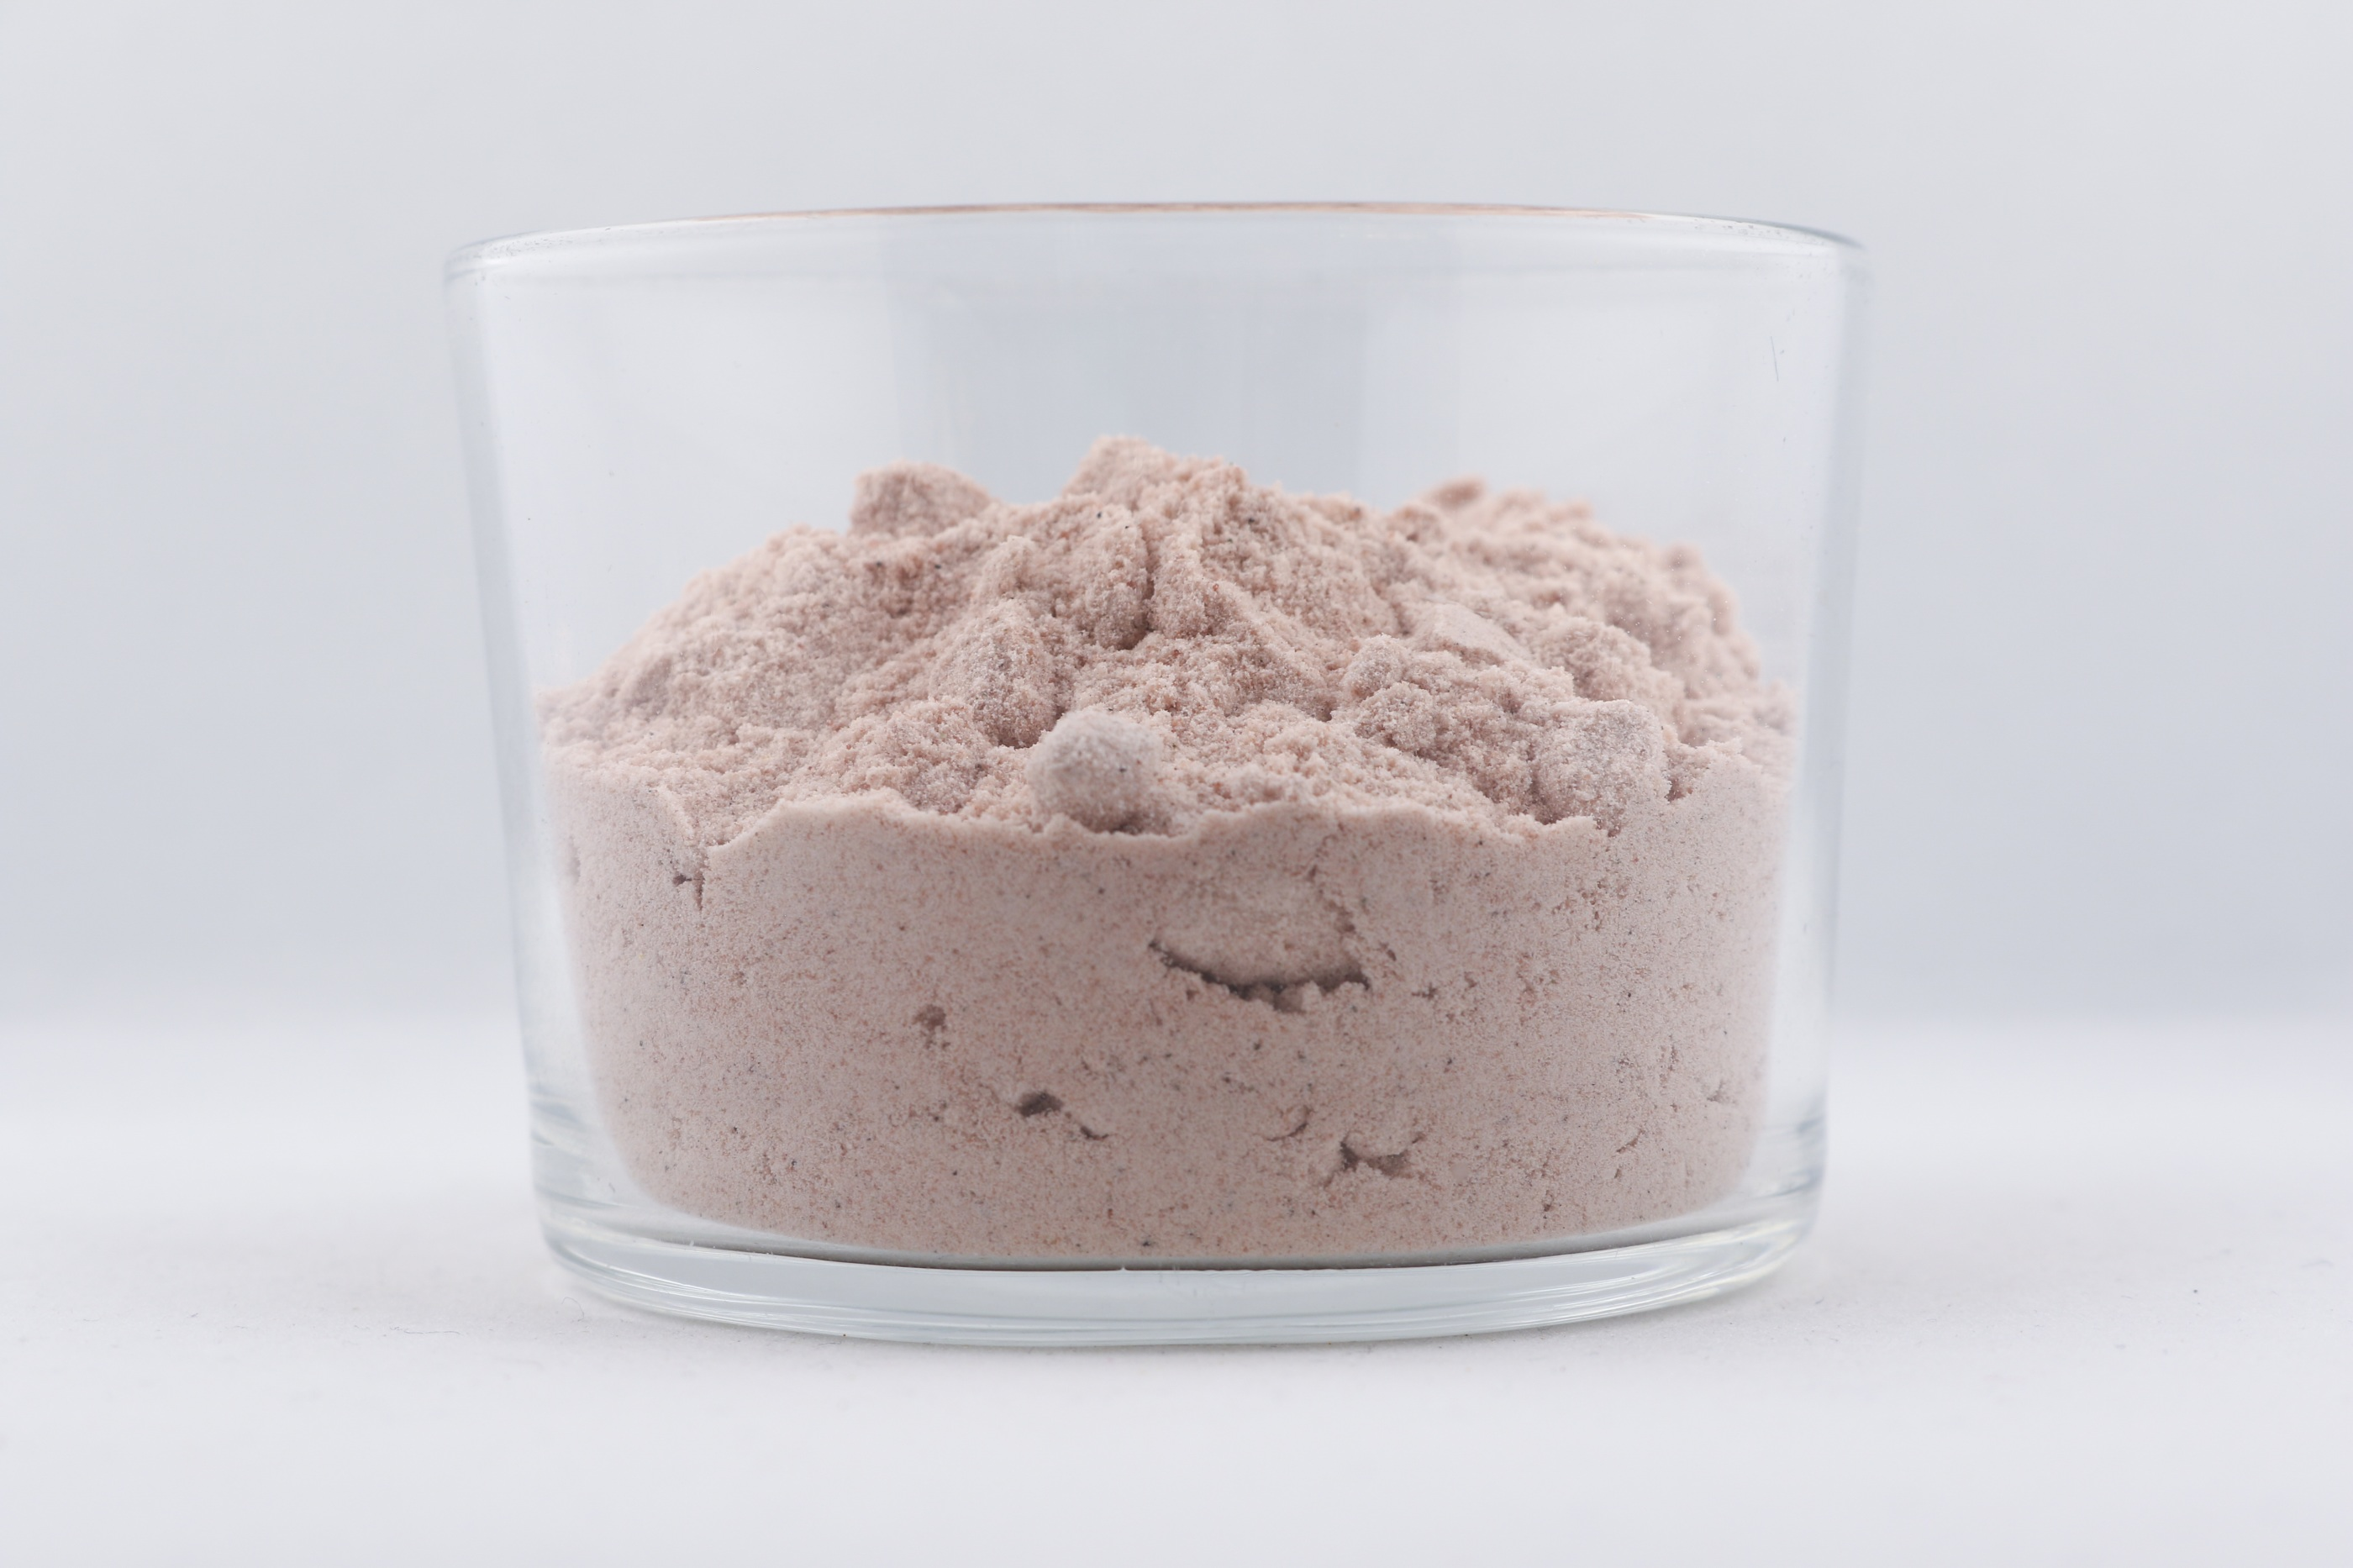 Himalaya salt Svartsalt wellness ayurveda halmstad sweden svensk krydda lösvikt